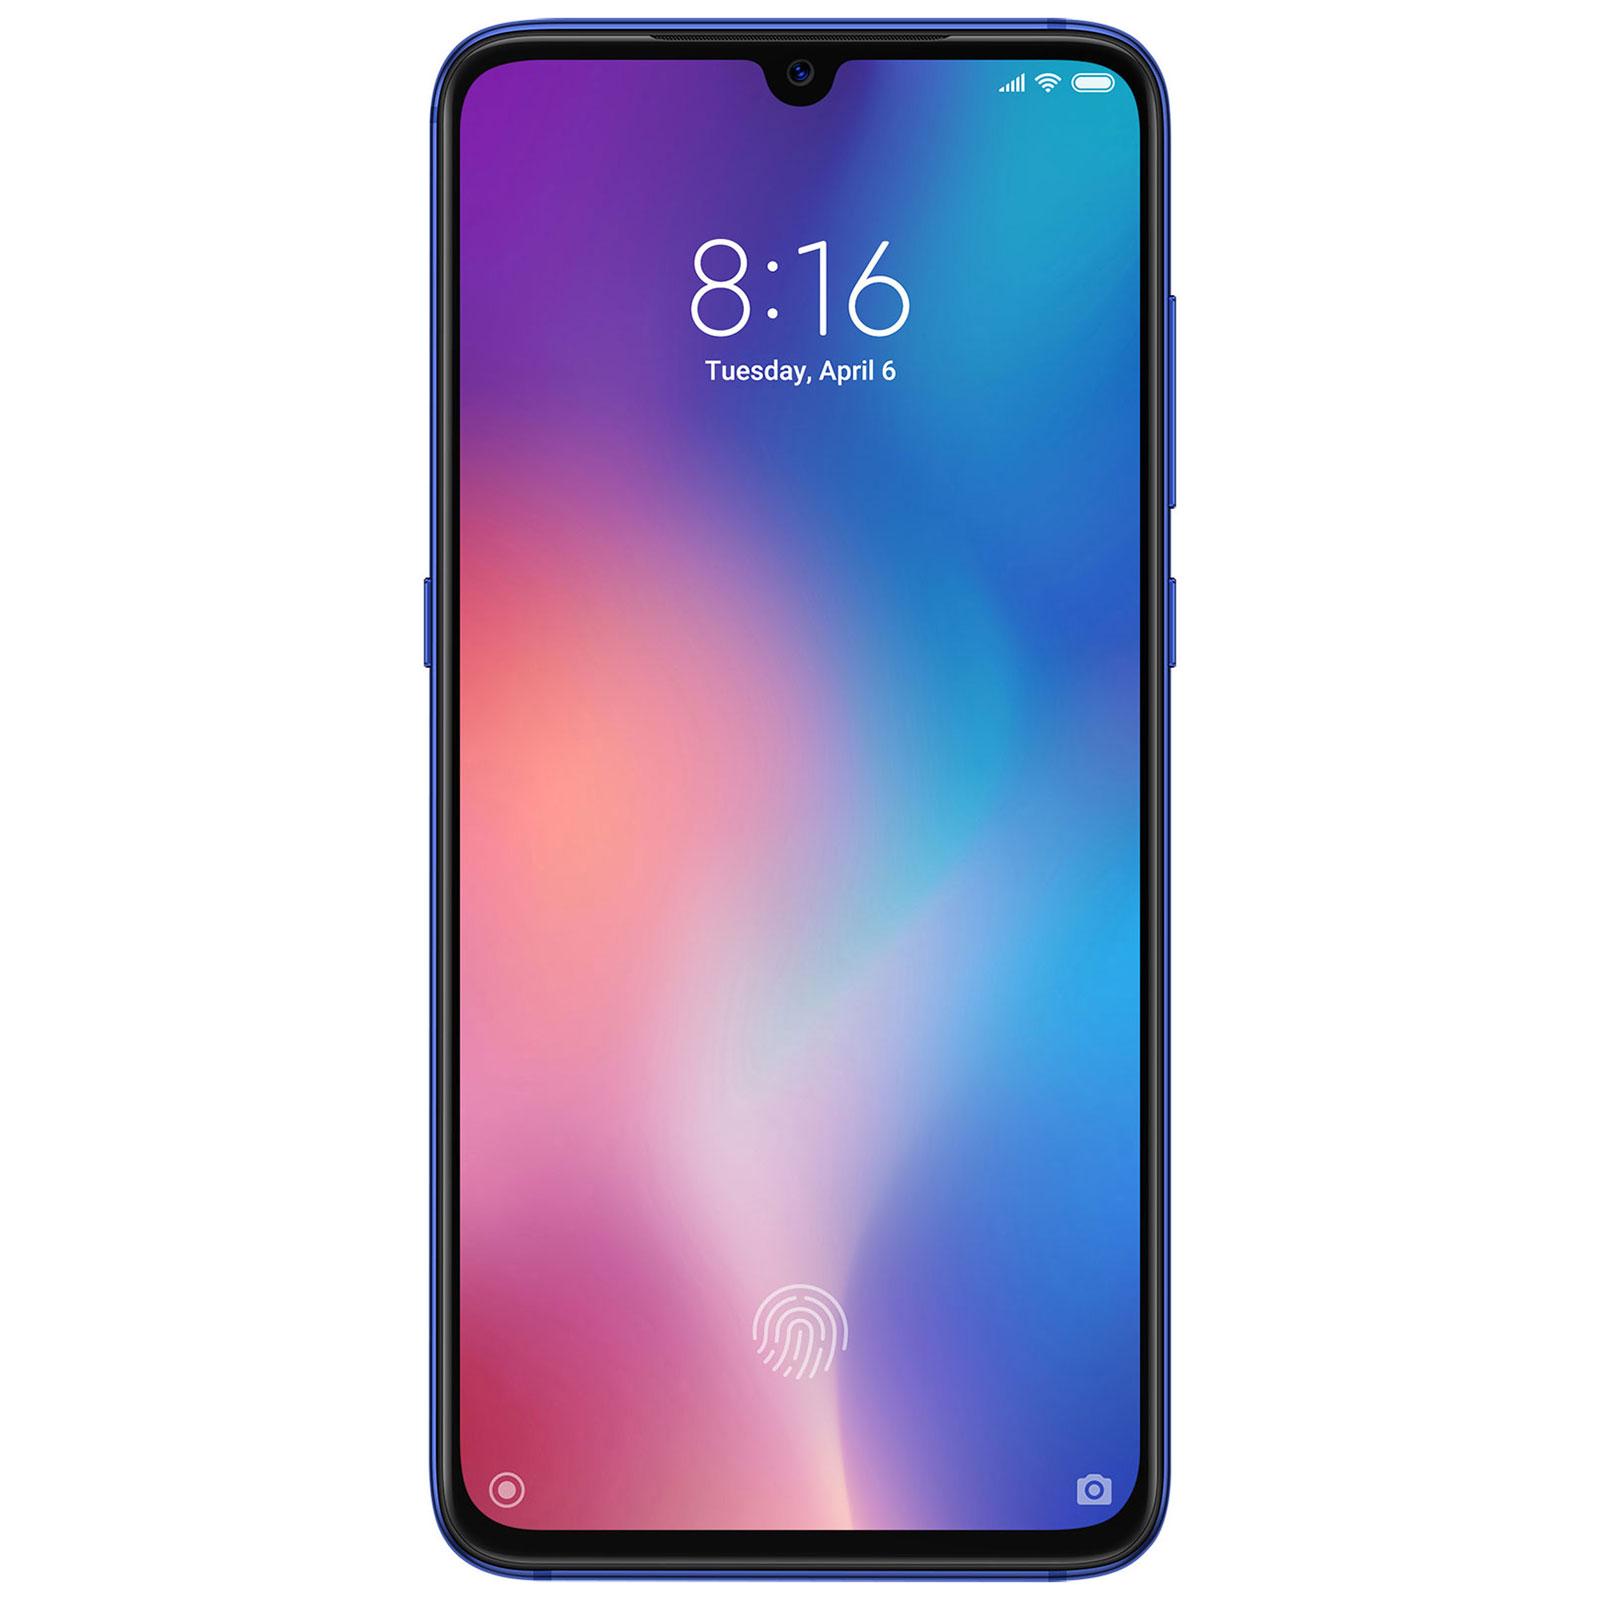 "Mobile & smartphone Xiaomi Mi 9 Bleu (64 Go) Smartphone 4G-LTE Advanced Dual SIM - Snapdragon 855 Octo-Core 2.84 GHz - RAM 6 Go - Ecran tactile AMOLED 6.39"" 1080 x 2340 - 64 Go - NFC/Bluetooth 5.0 - 3300 mAh - Android 9.0"